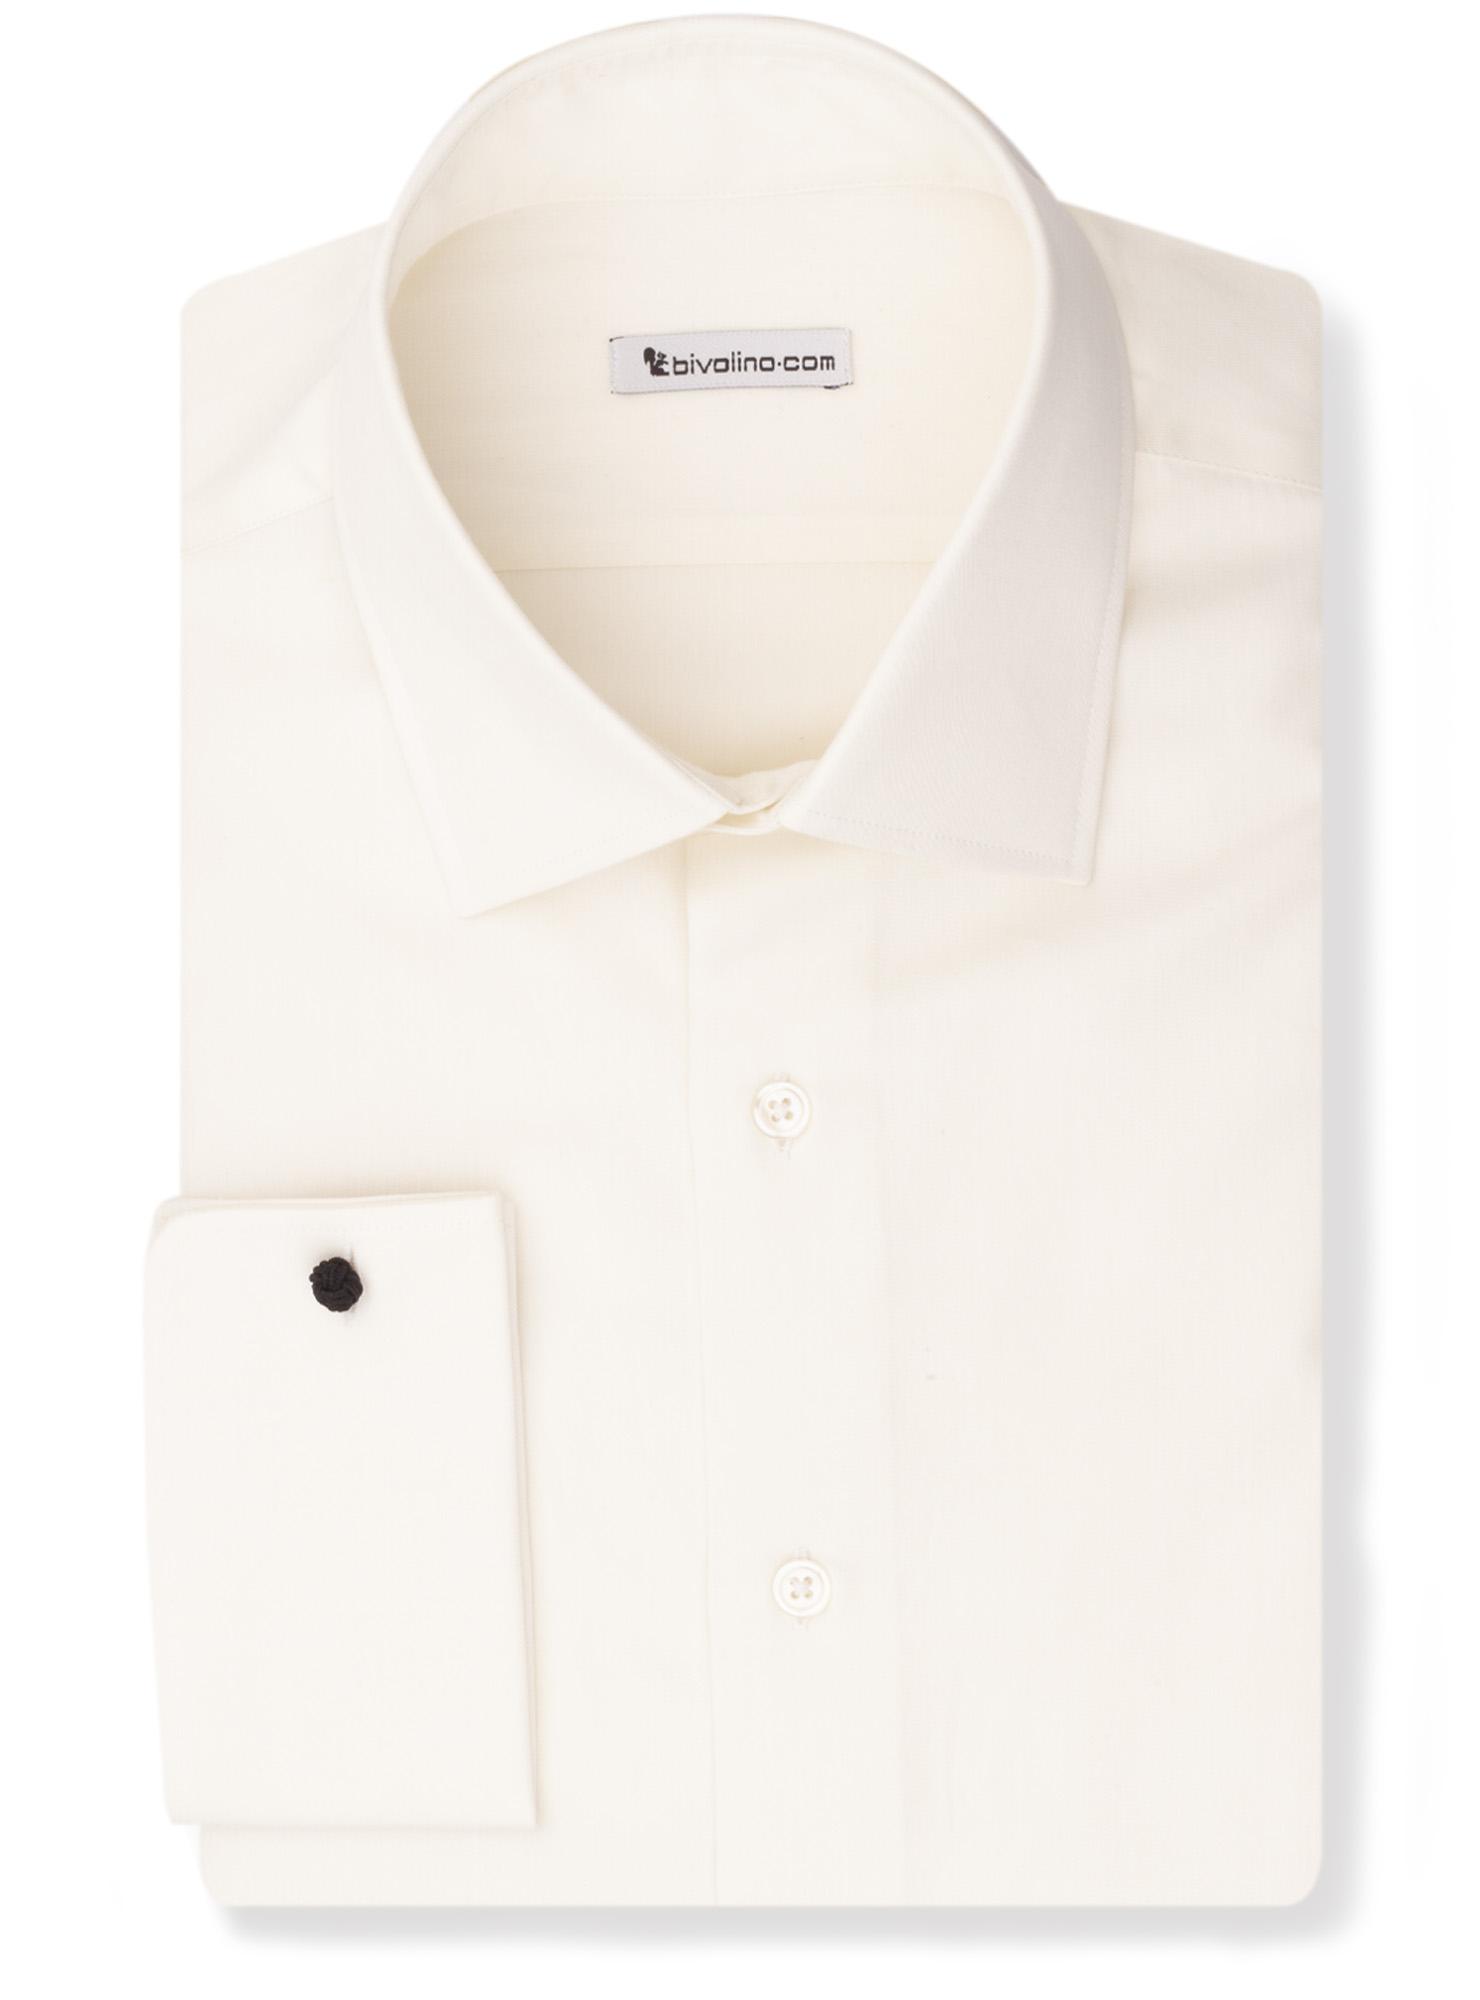 SPINICIA -  ivory poplin shirt - Spira 2